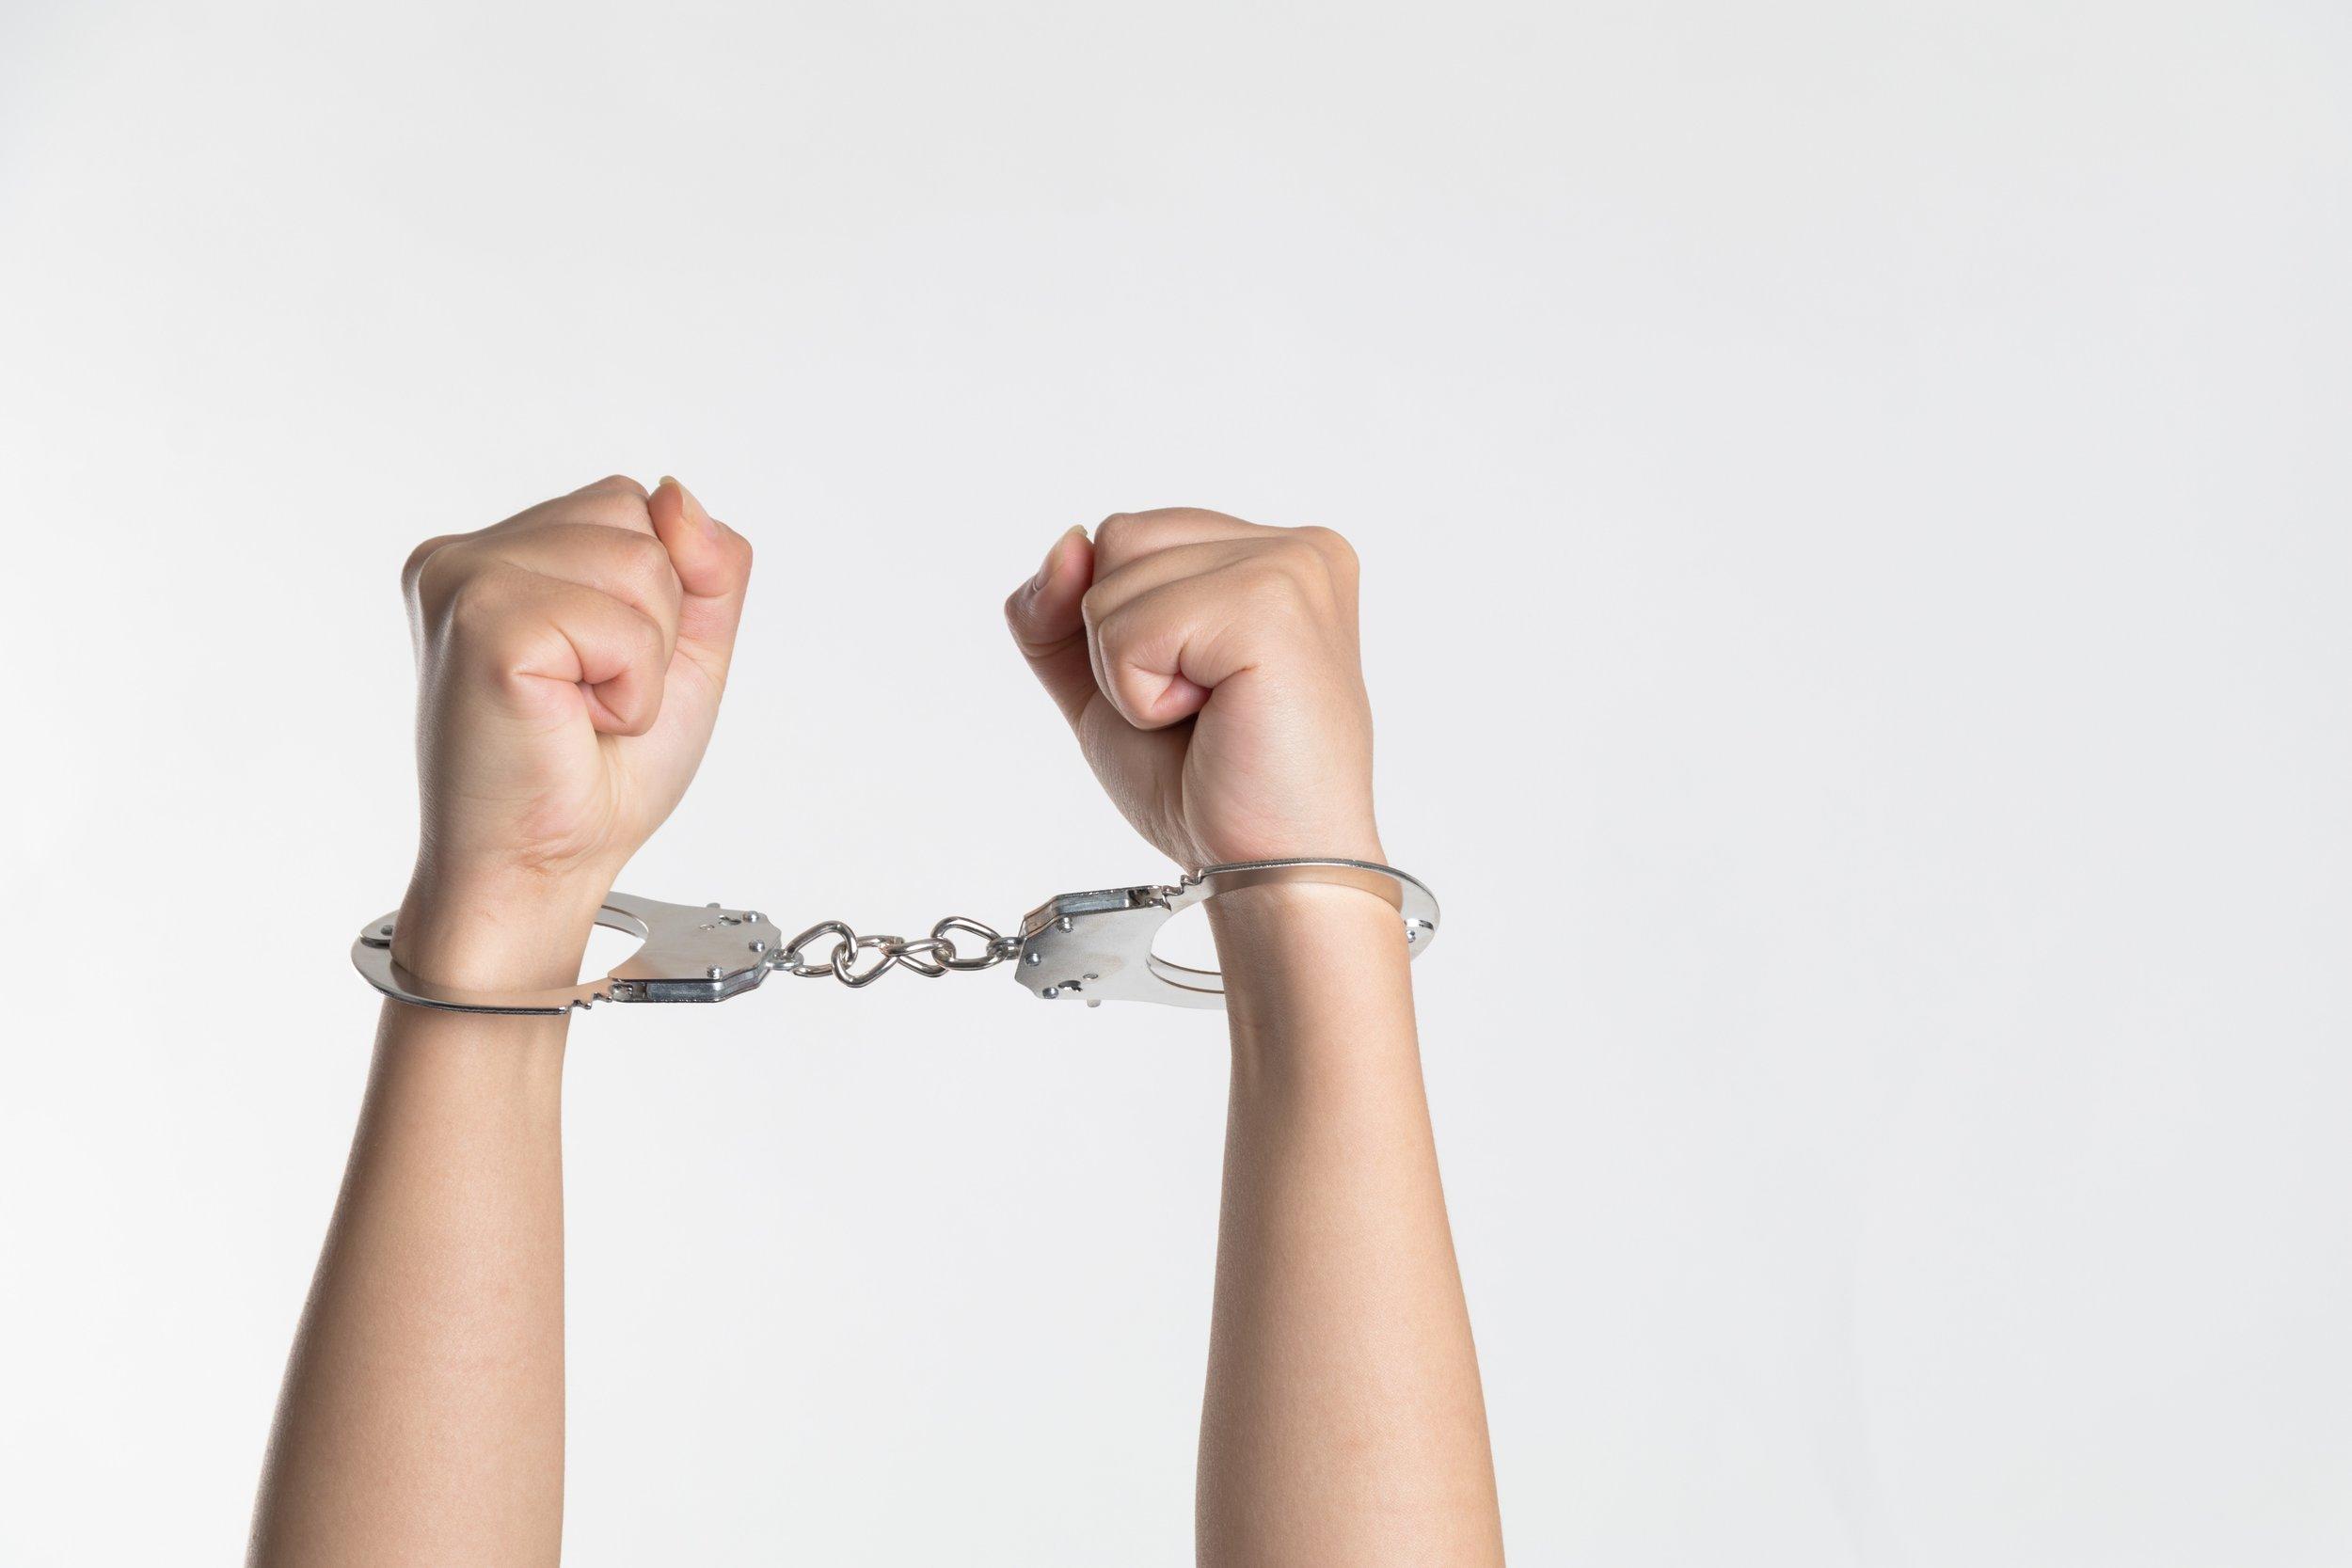 arrested dwi dui jail